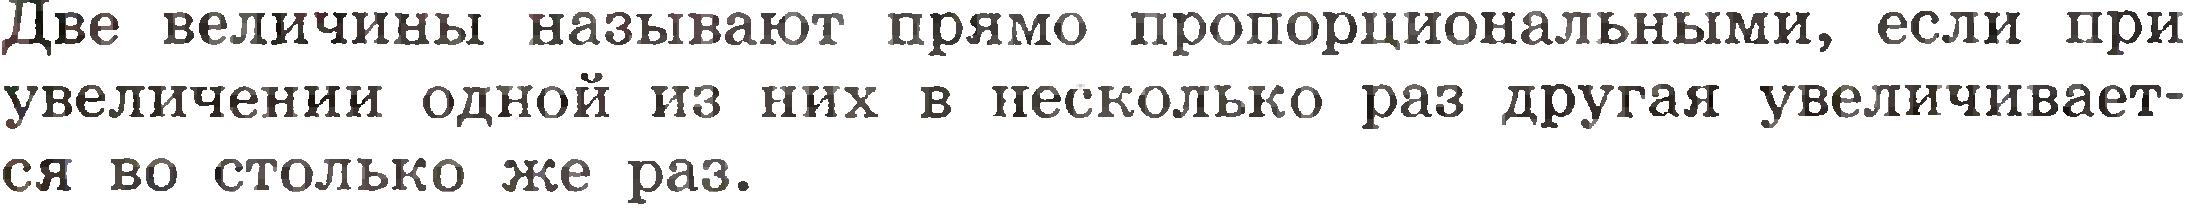 hello_html_63ed23fc.png